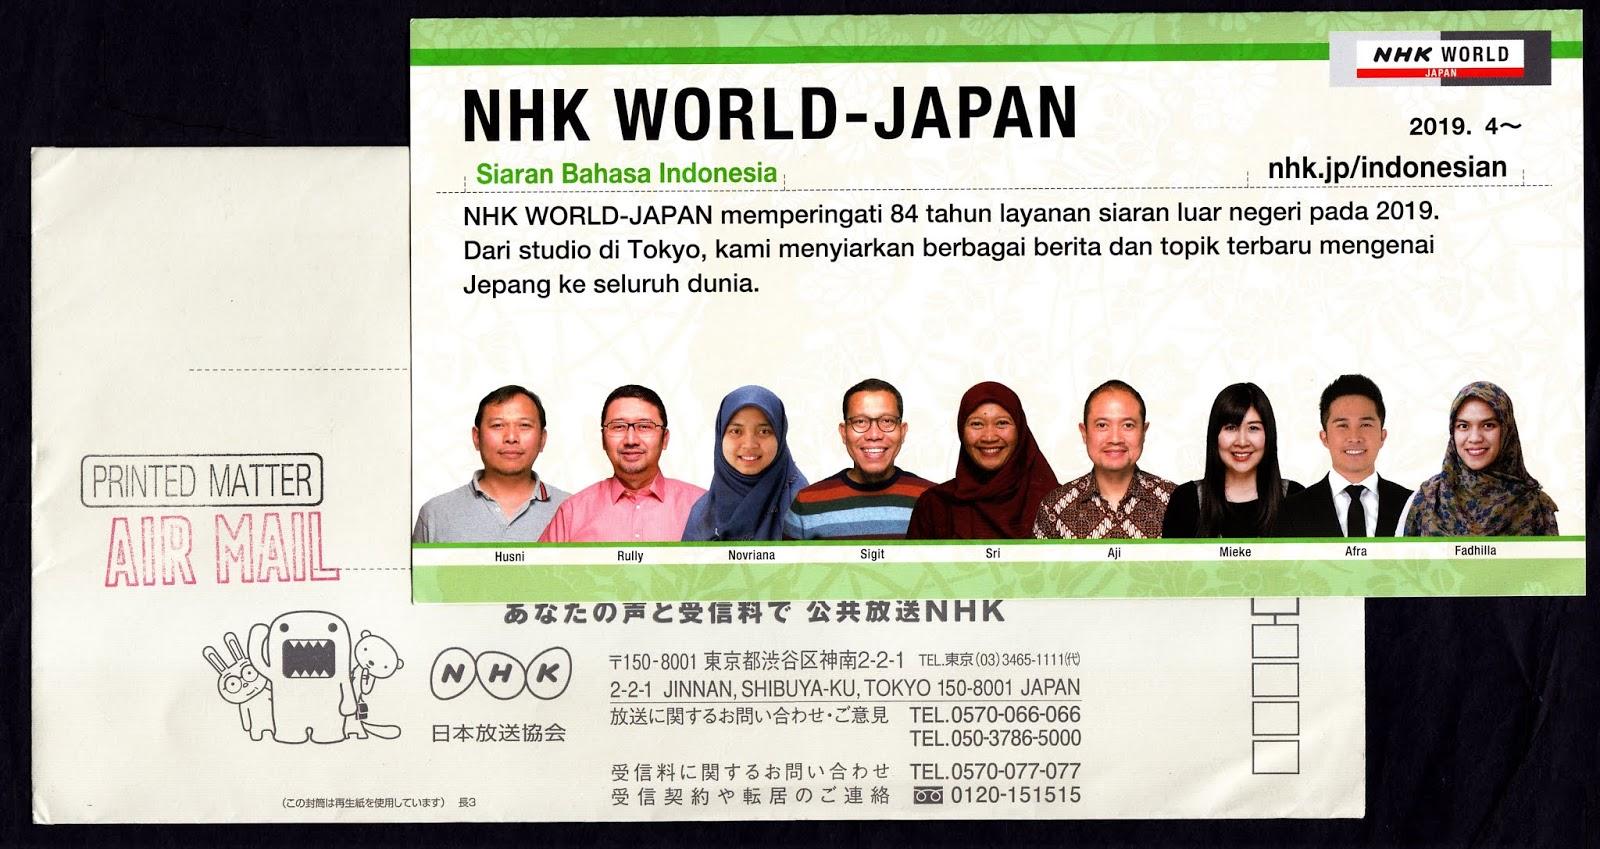 SOUTH EAST ASIA DXING: NHK World Radio Japan (via Koror)